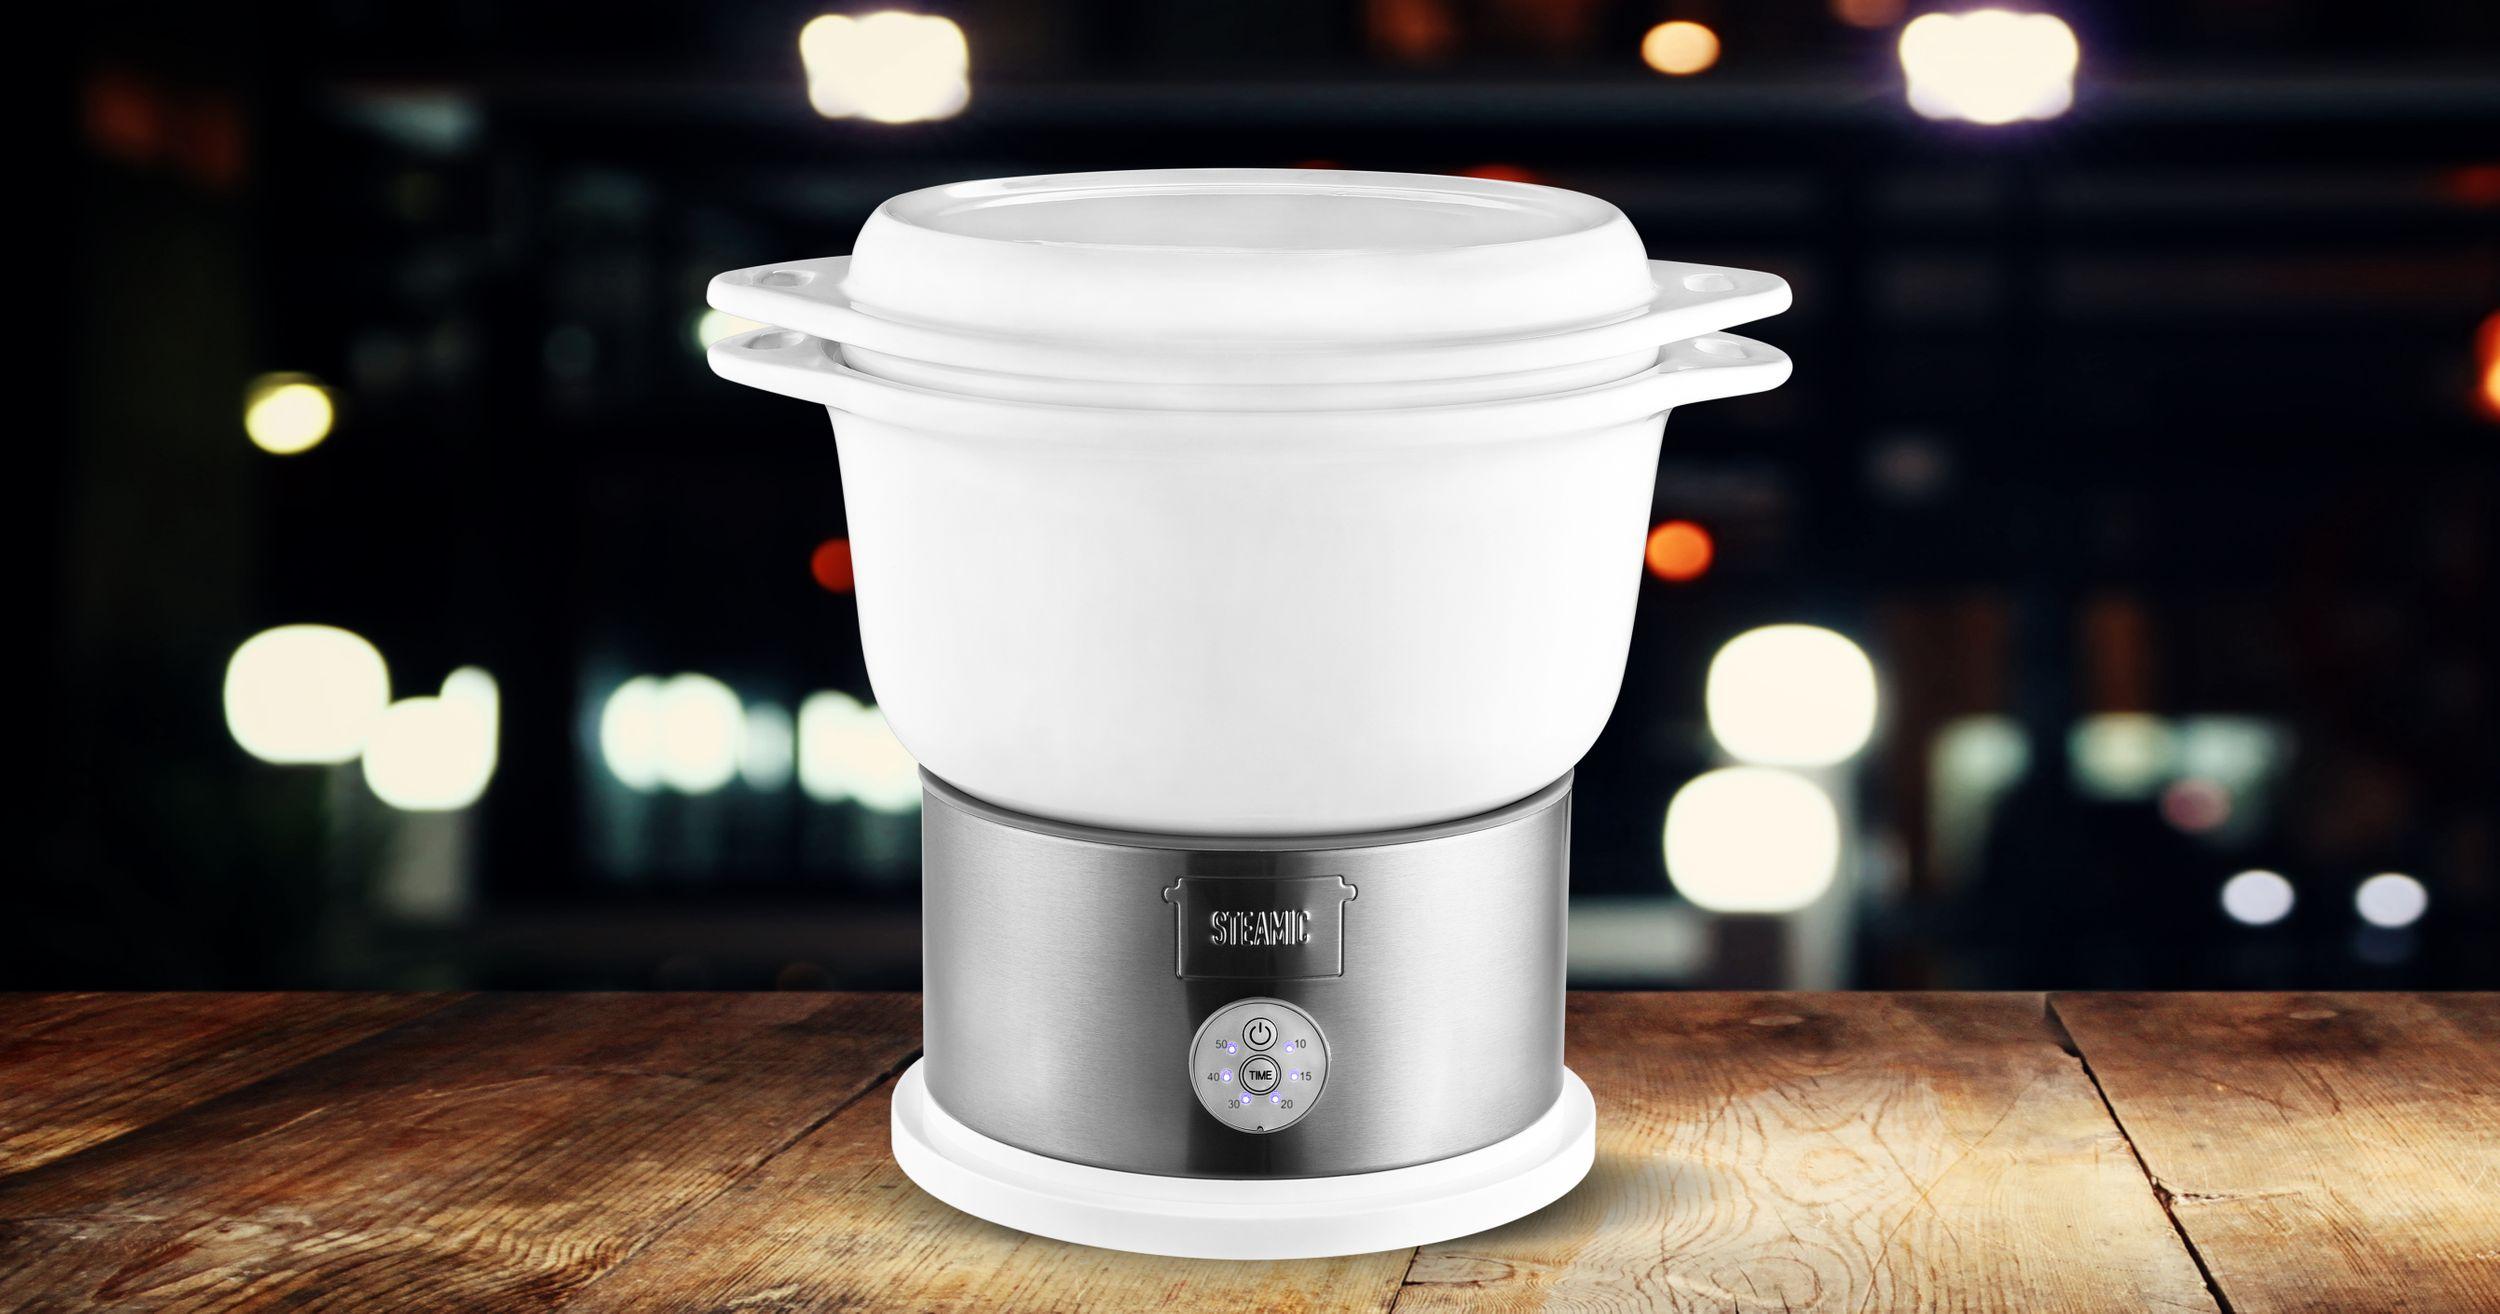 KERAMIK Dampfgarer BPA-frei Timer One-Touch-Bedienung 4,5